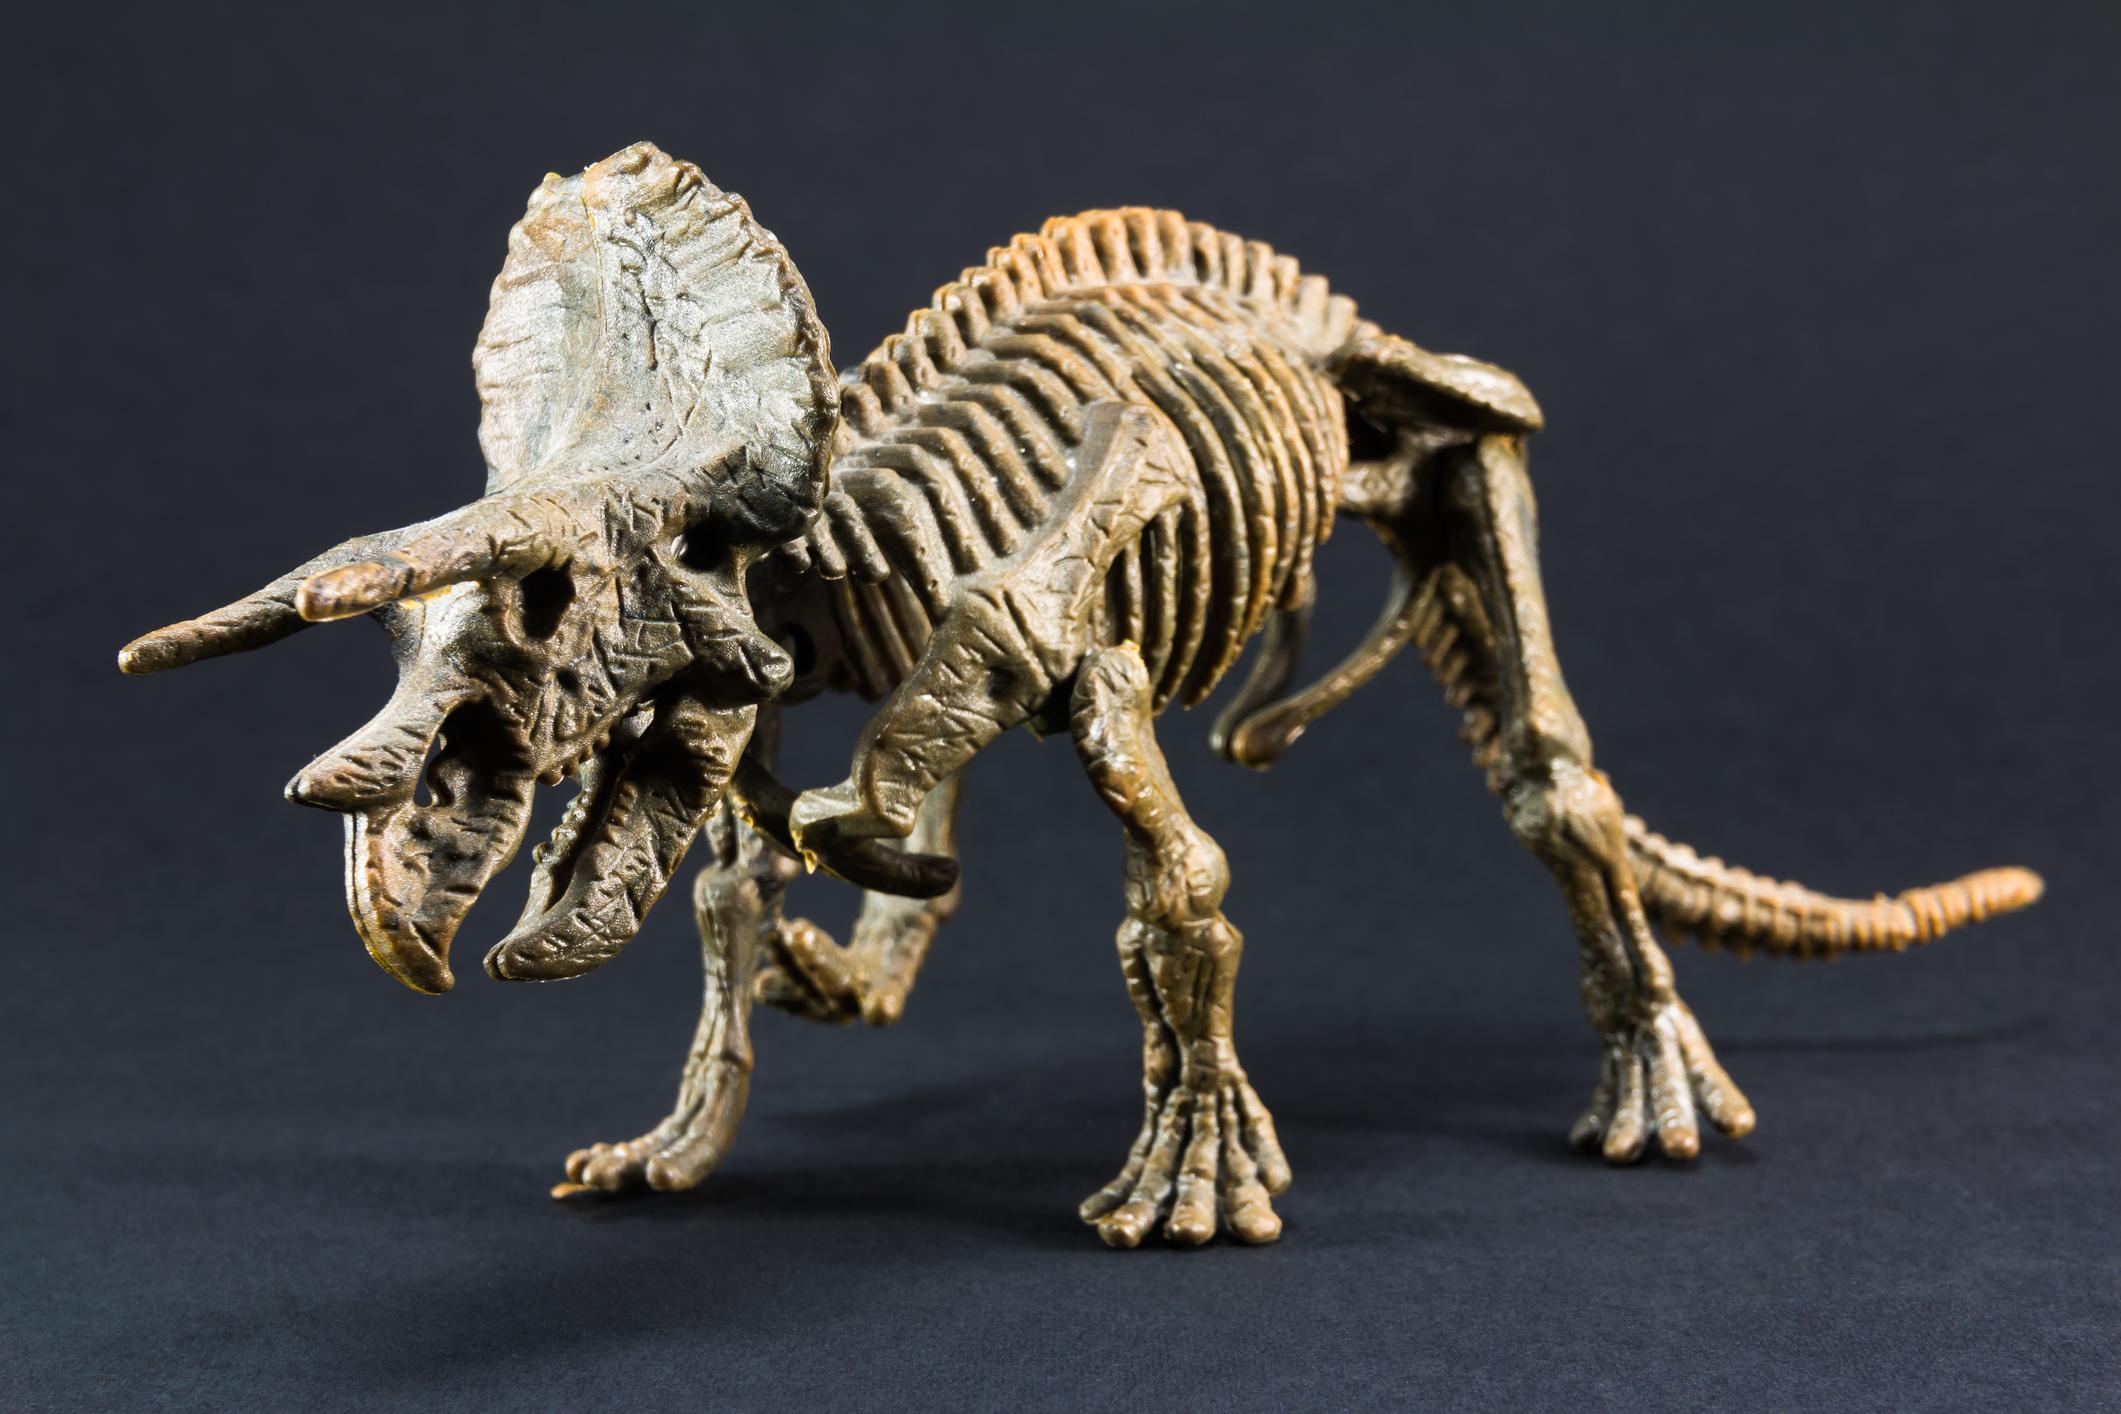 Triceratops fossil dinosaur skeleton model toy on black background